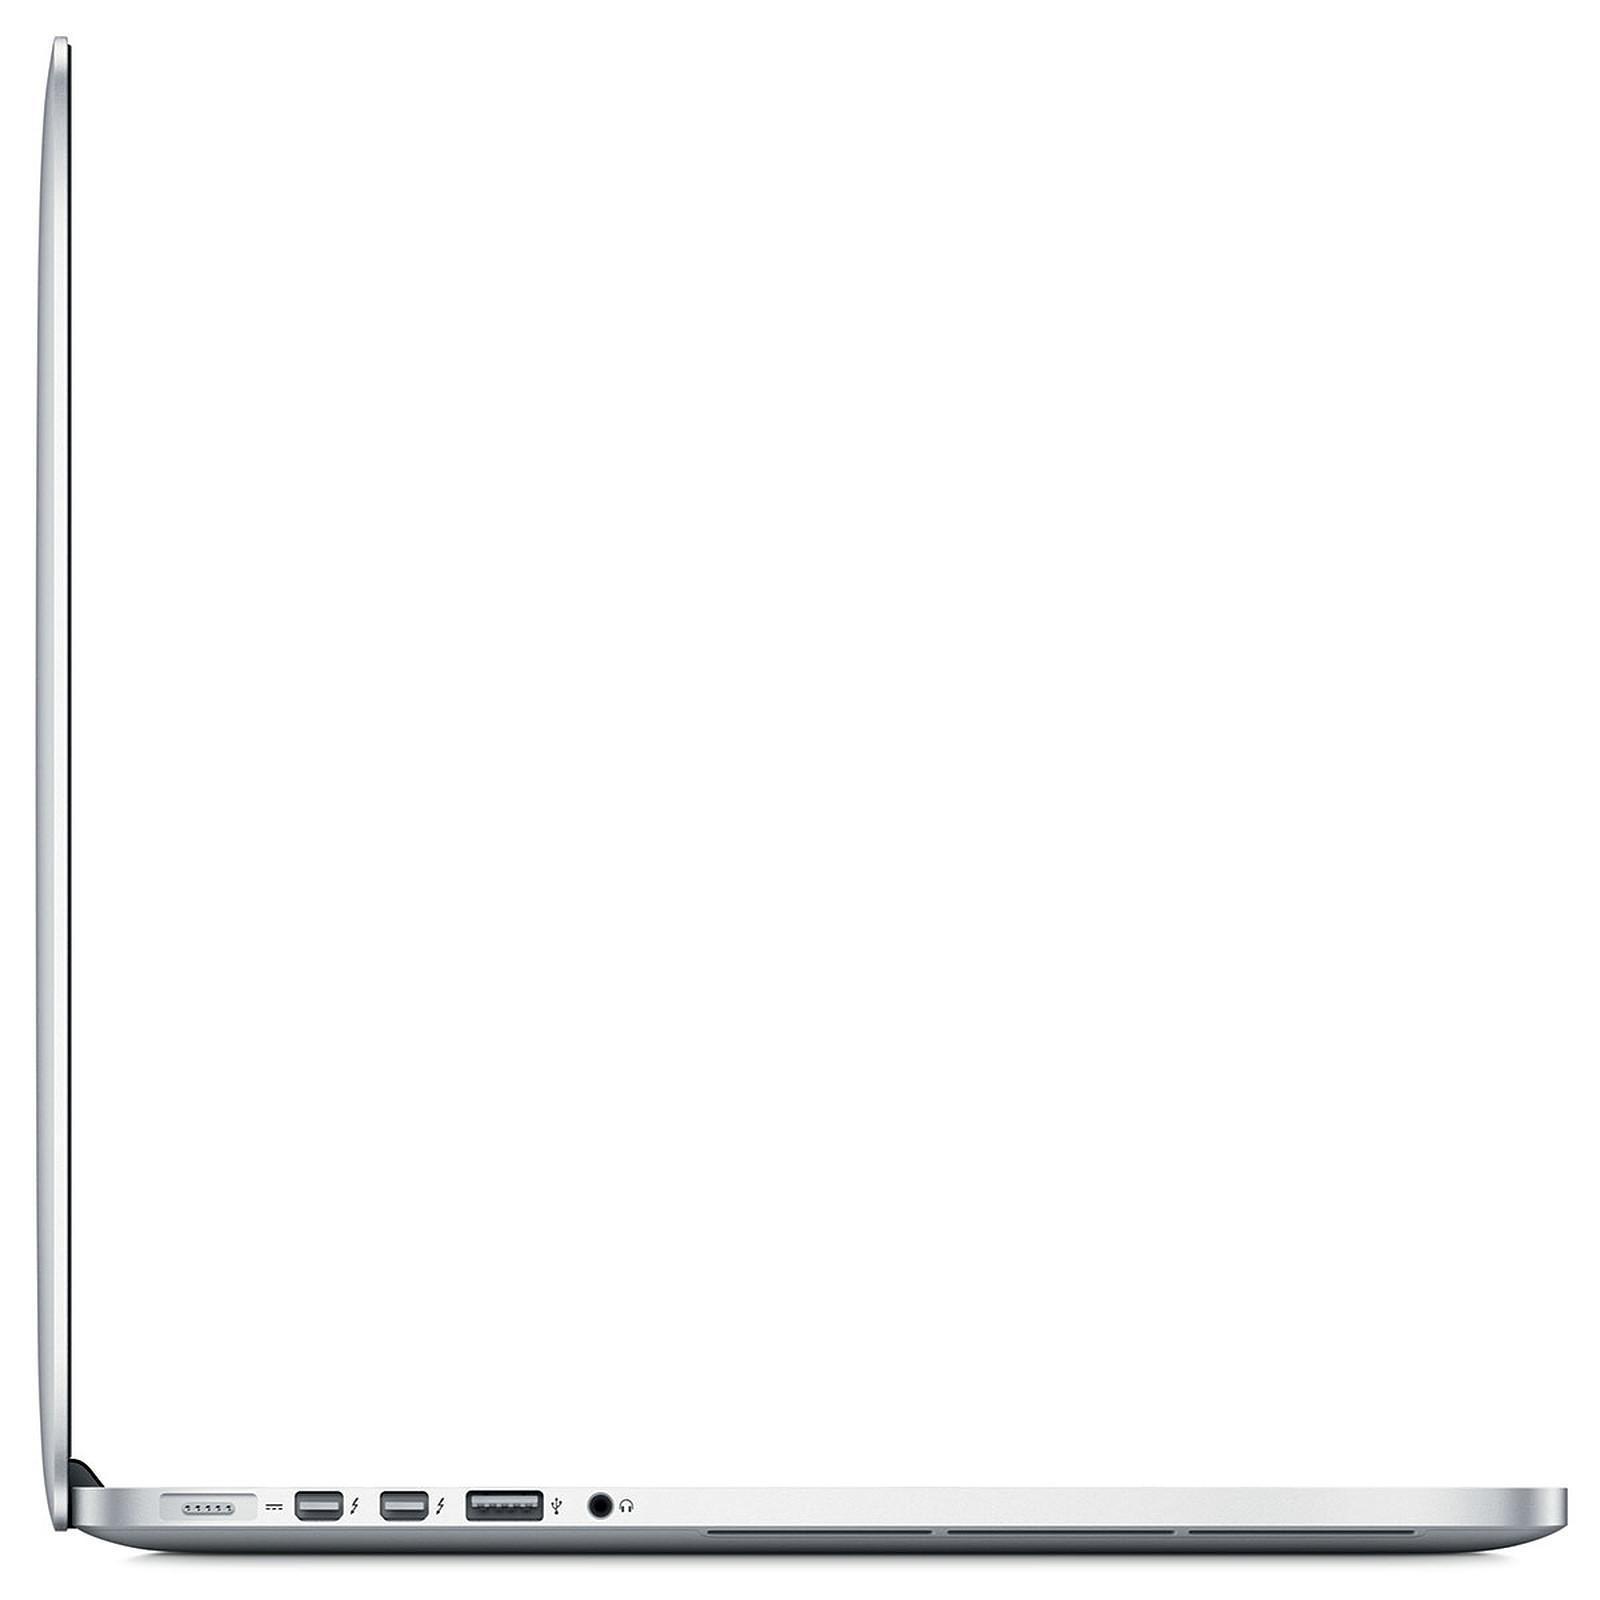 MacBook Pro Retina 15.4-inch (2015) - Core i7 - 16GB - SSD 256 GB